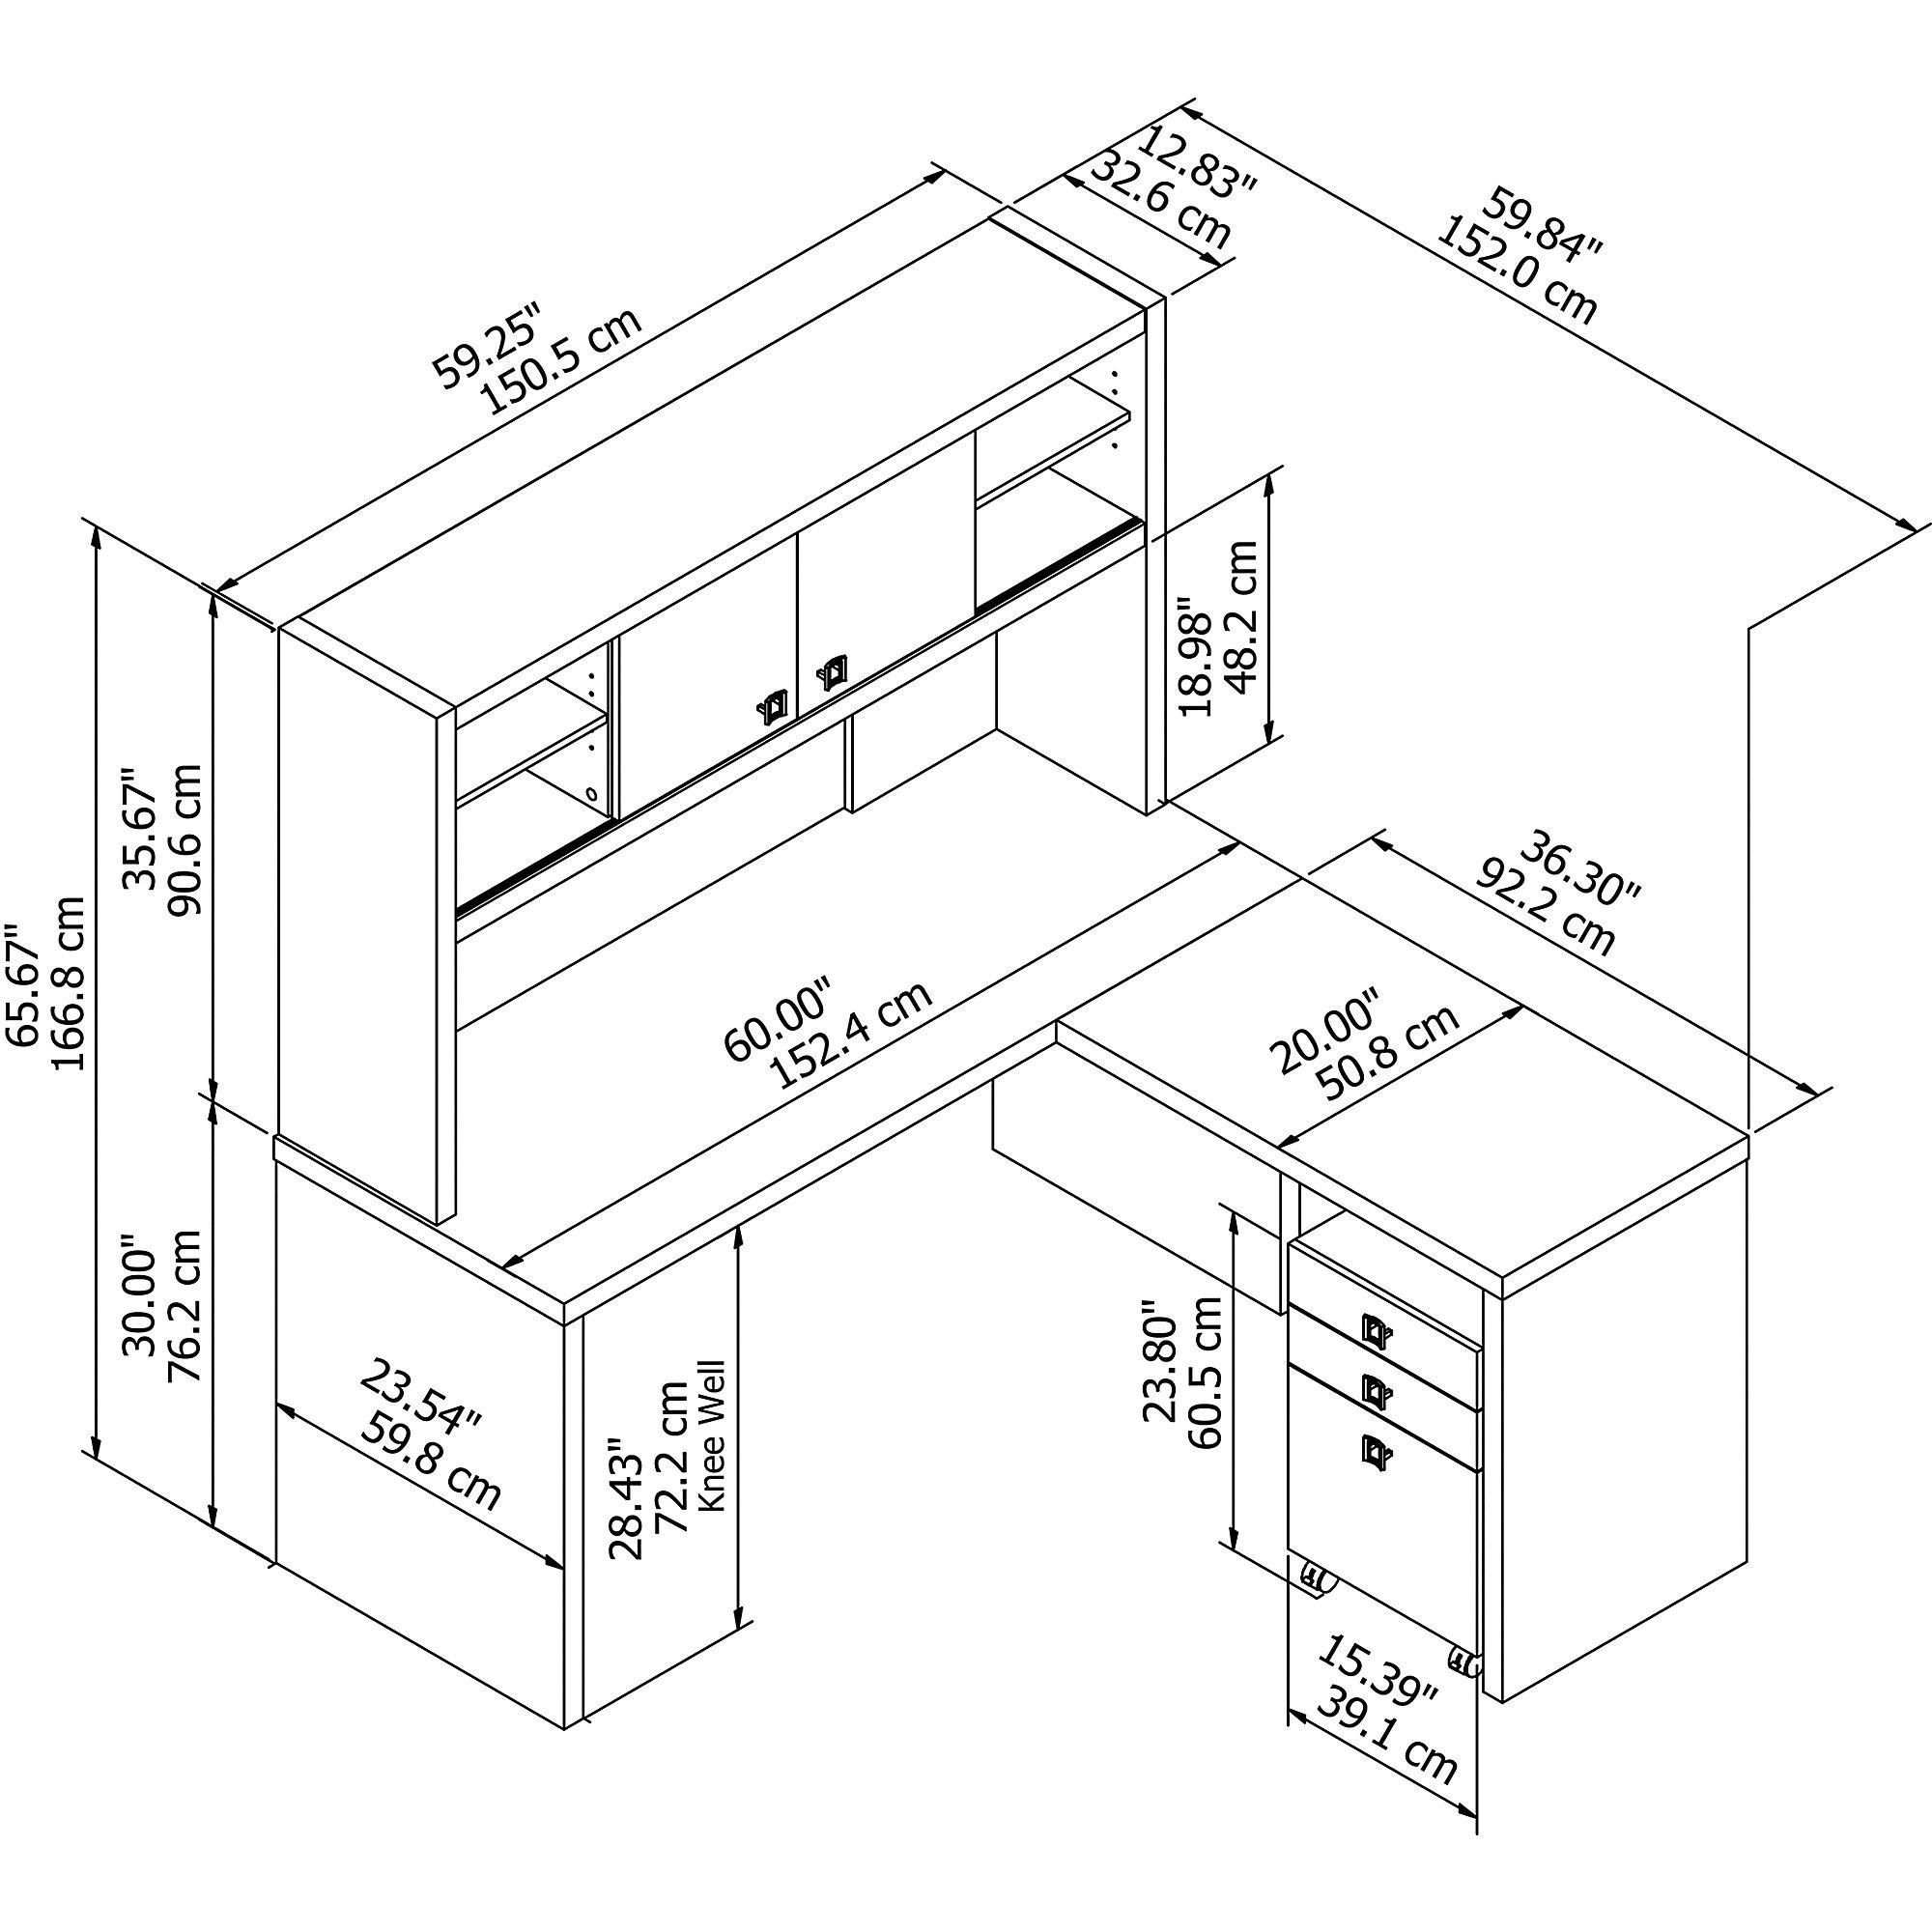 ech009 dimensions